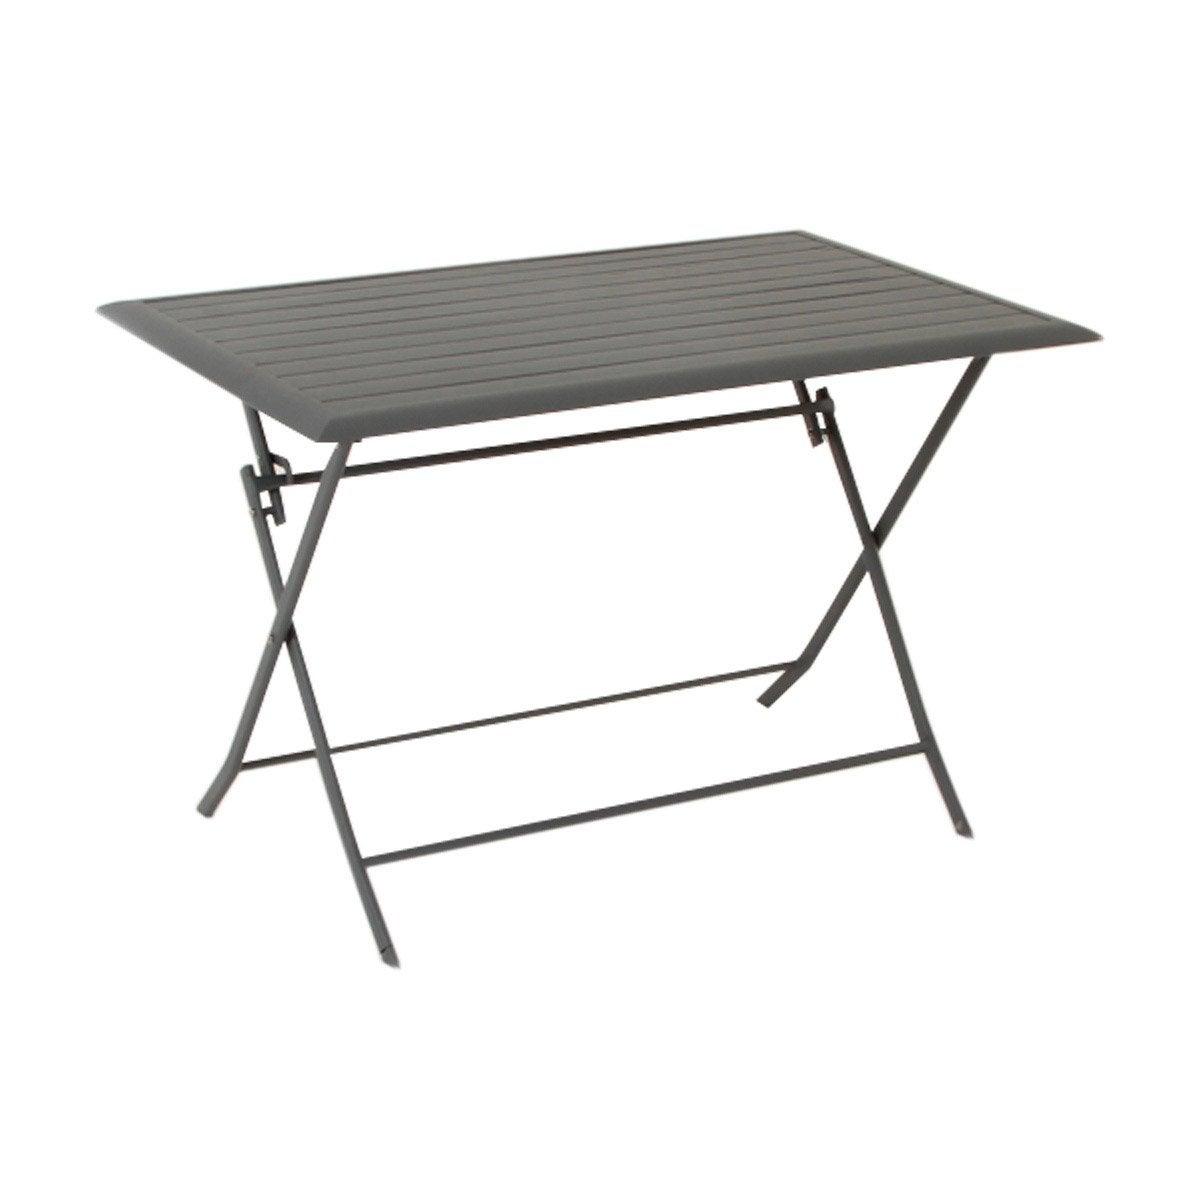 table de jardin hesperide azua rectangulaire ardoise 4 personnes leroy merlin. Black Bedroom Furniture Sets. Home Design Ideas